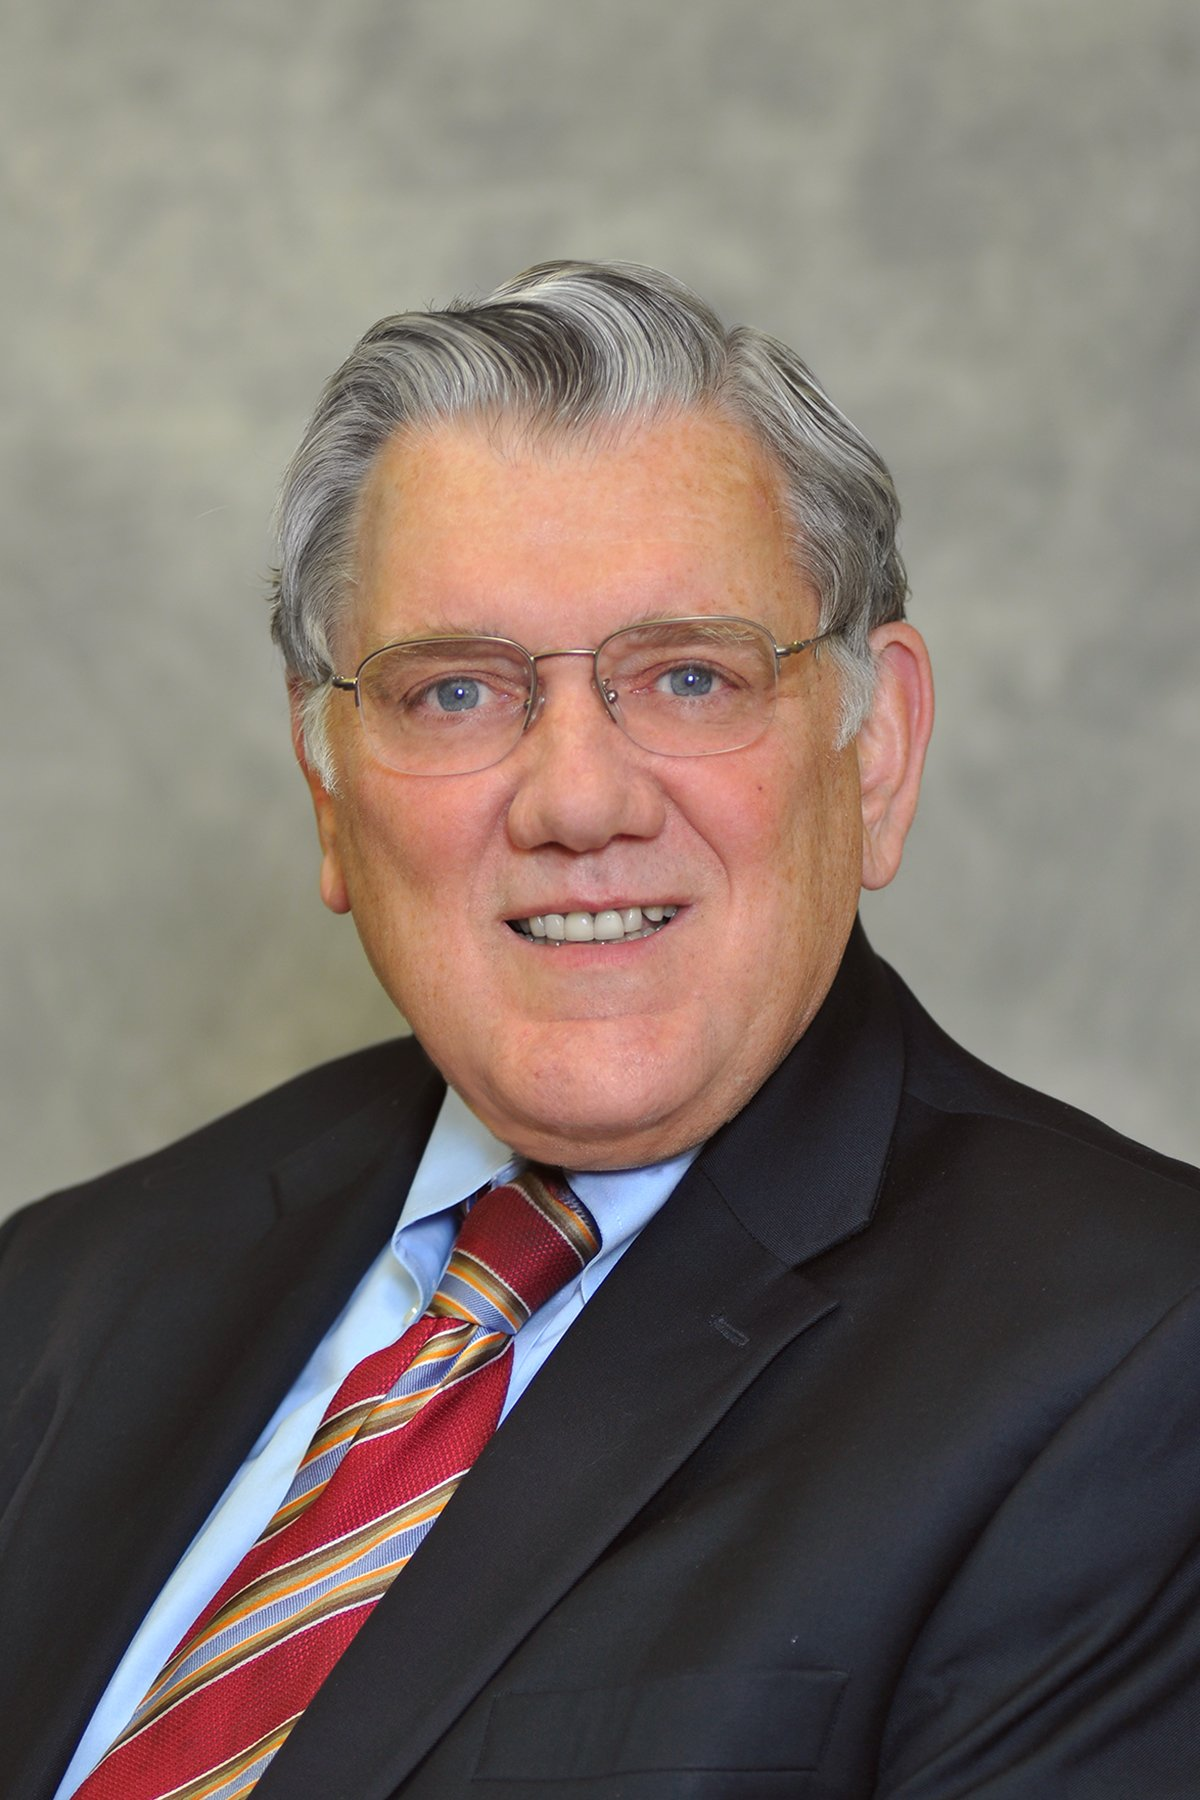 David Kirlin, MD, OHC President & Chief Medical Officer